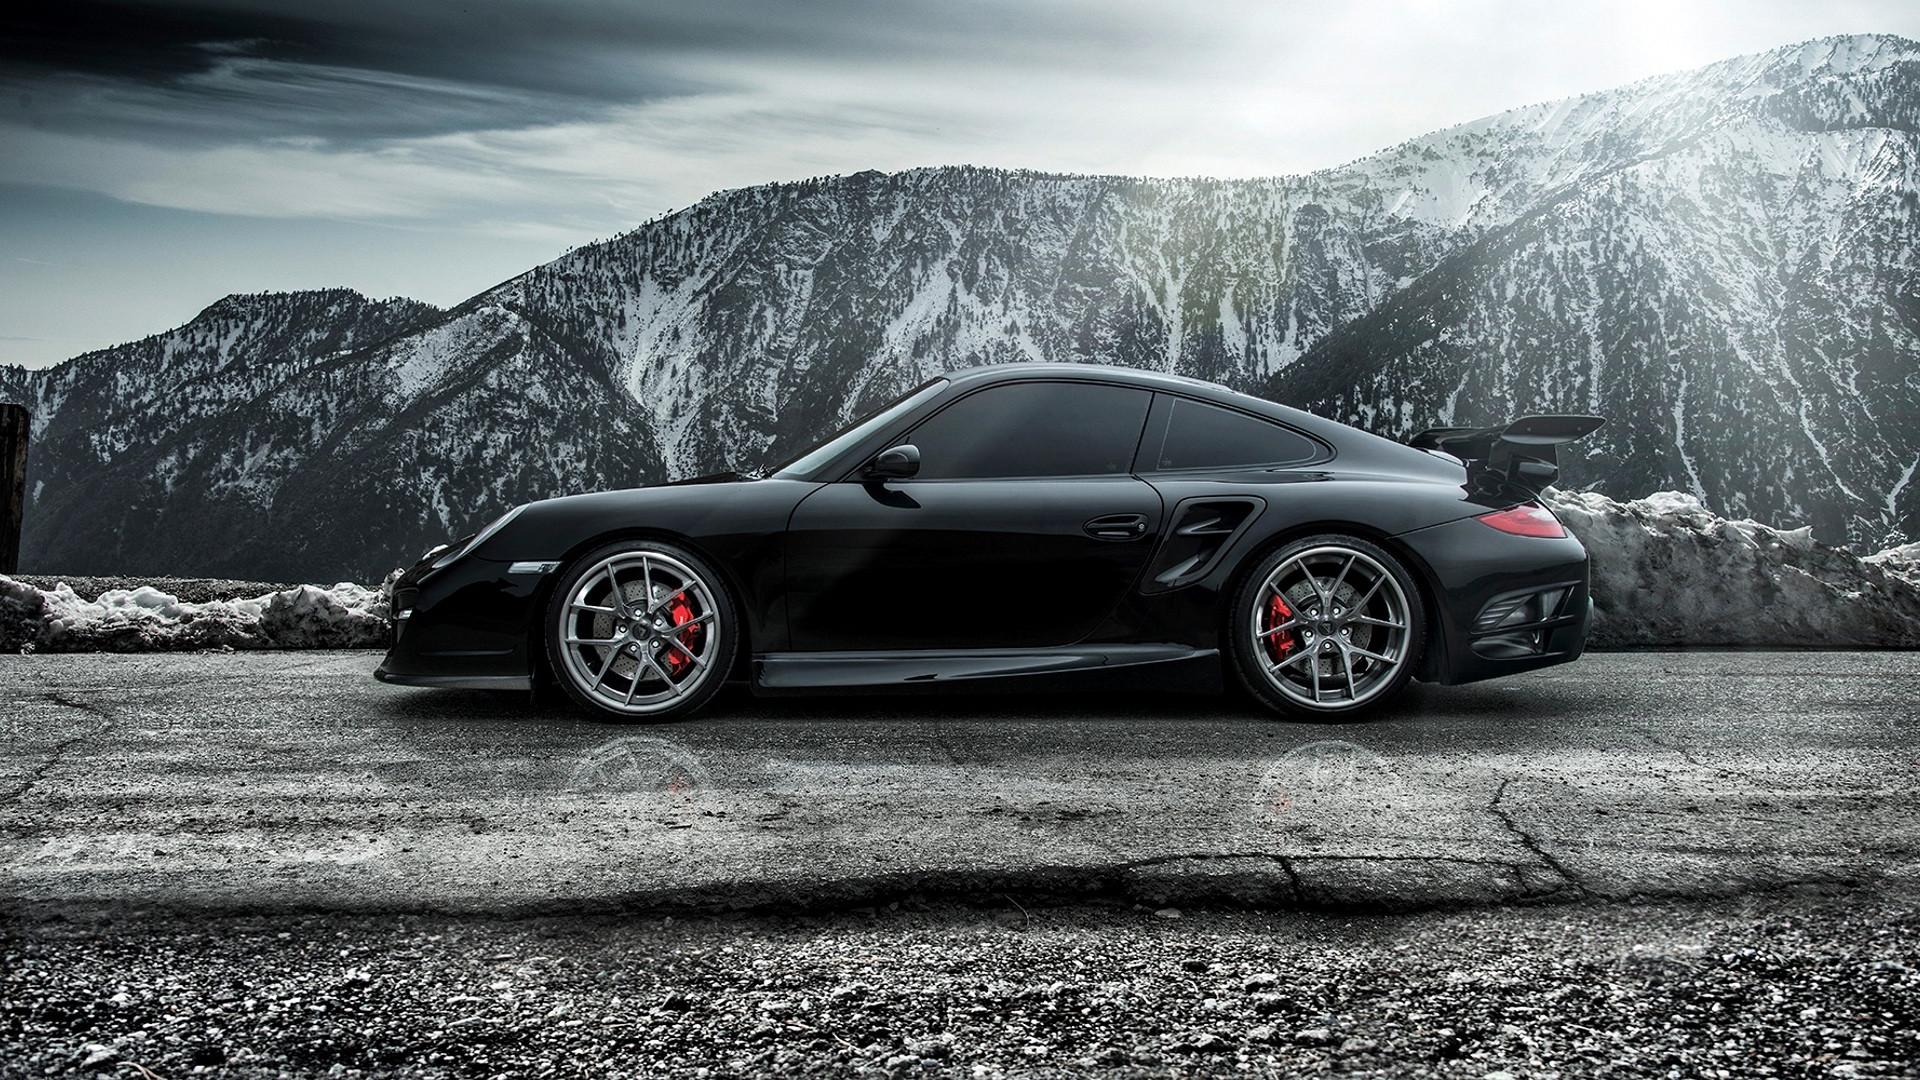 Porsche Carrera S Coupe by TechArt Wallpaper  x